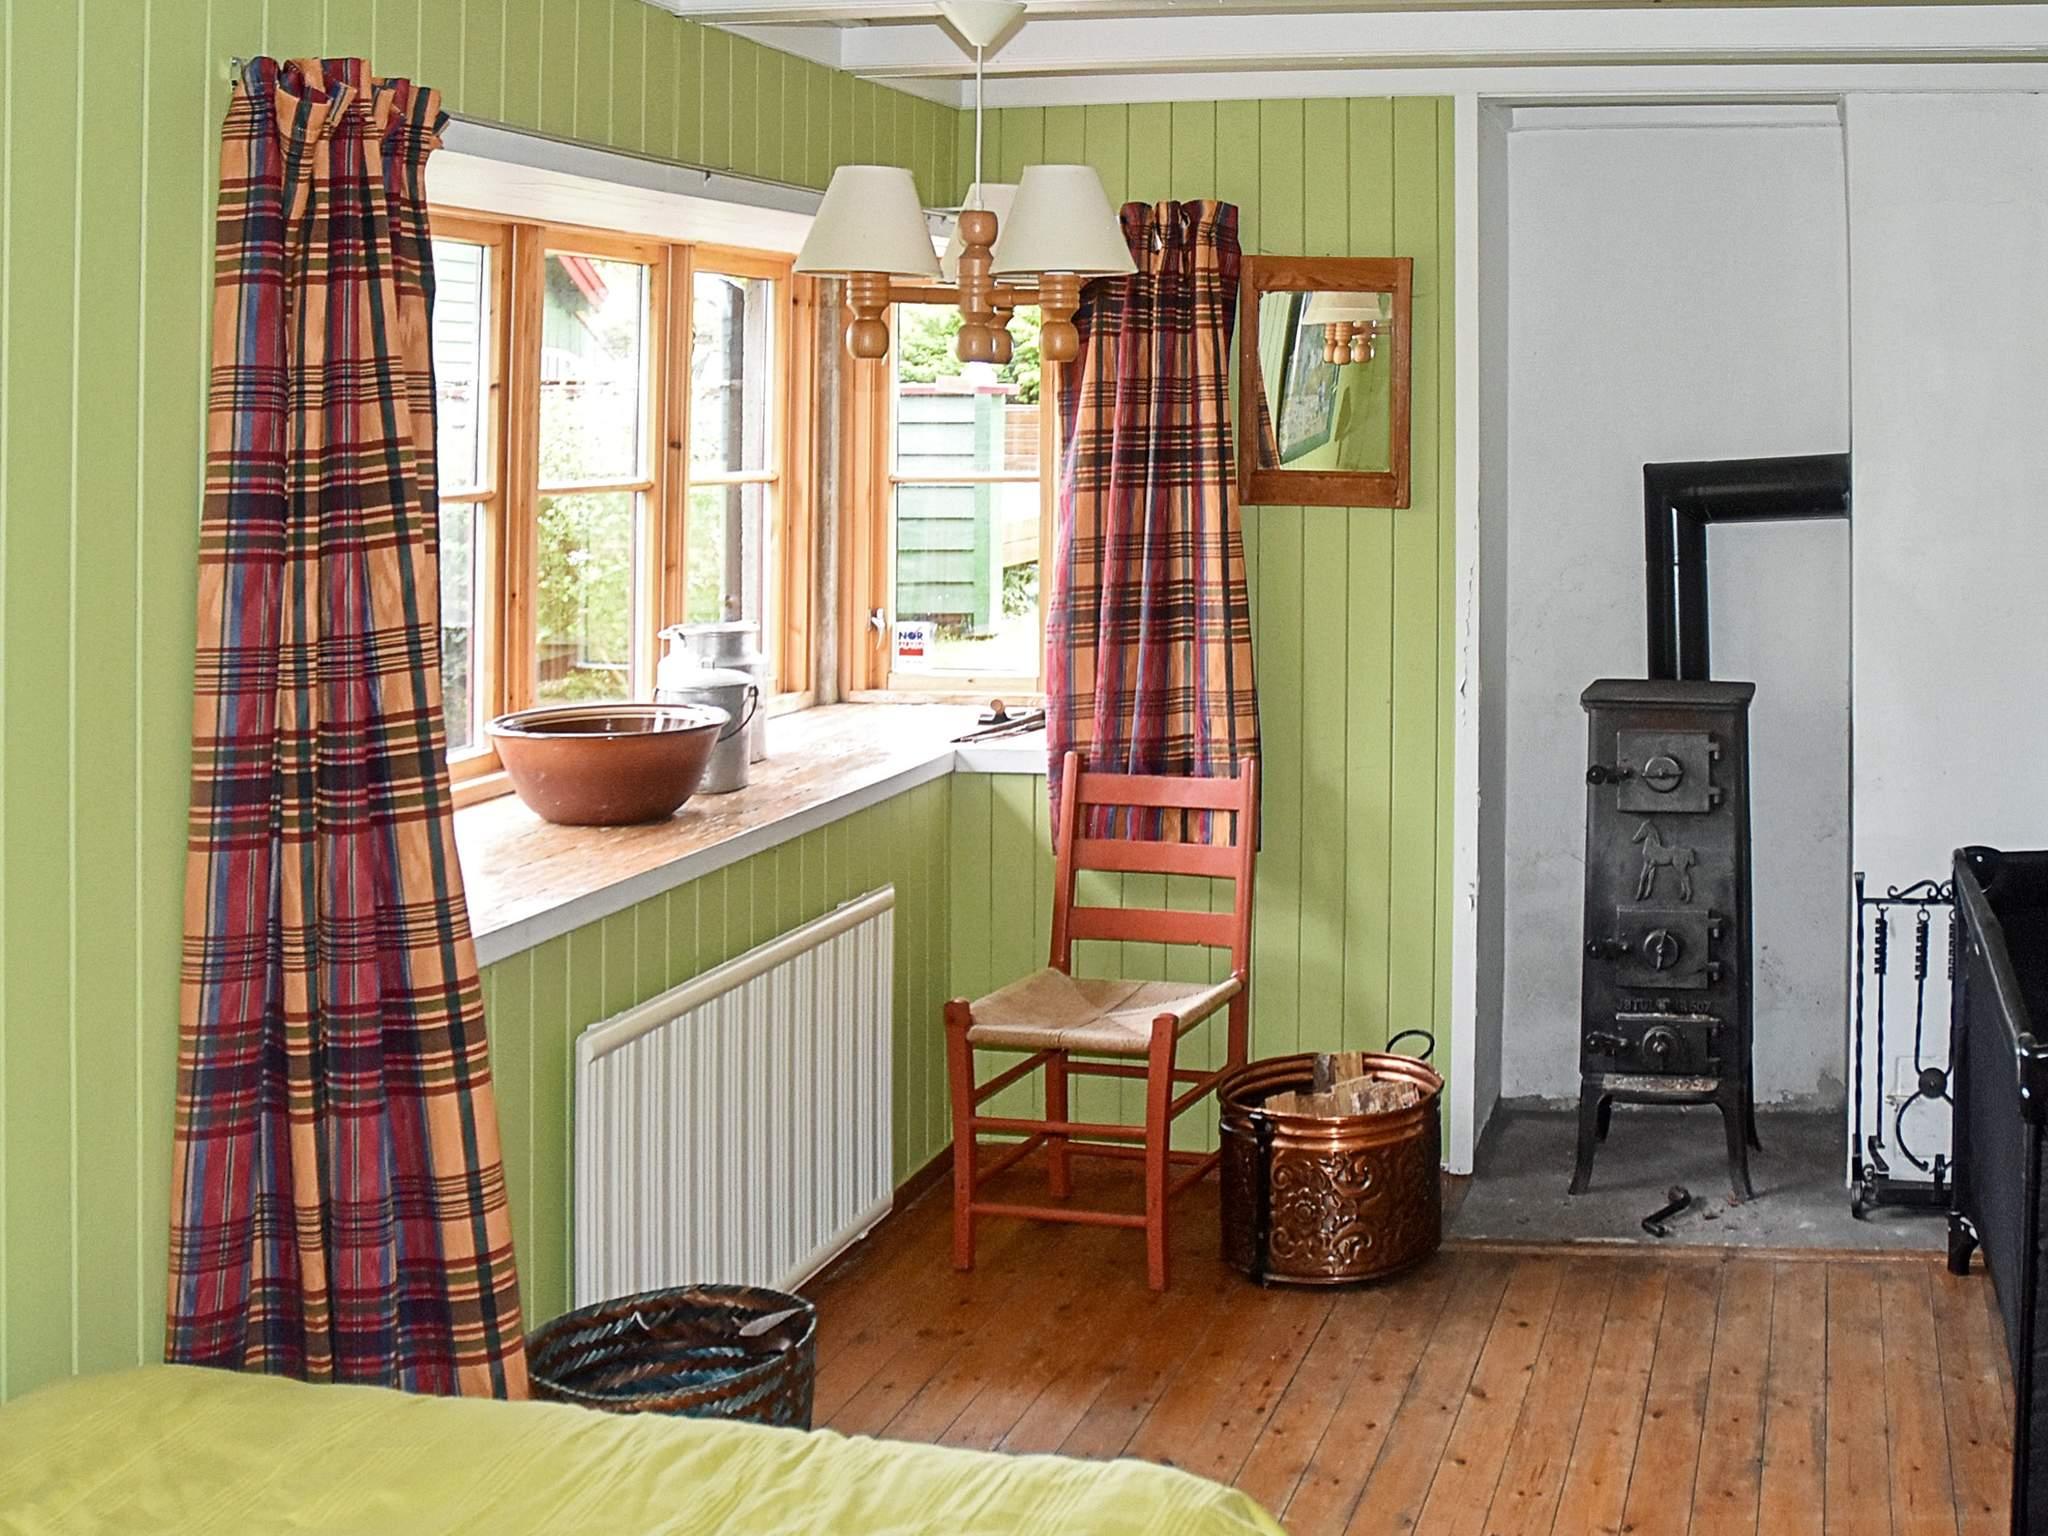 Ferienhaus Mølstrevåg (2463451), Sveio, Hordaland - Hardangerfjord, Westnorwegen, Norwegen, Bild 16